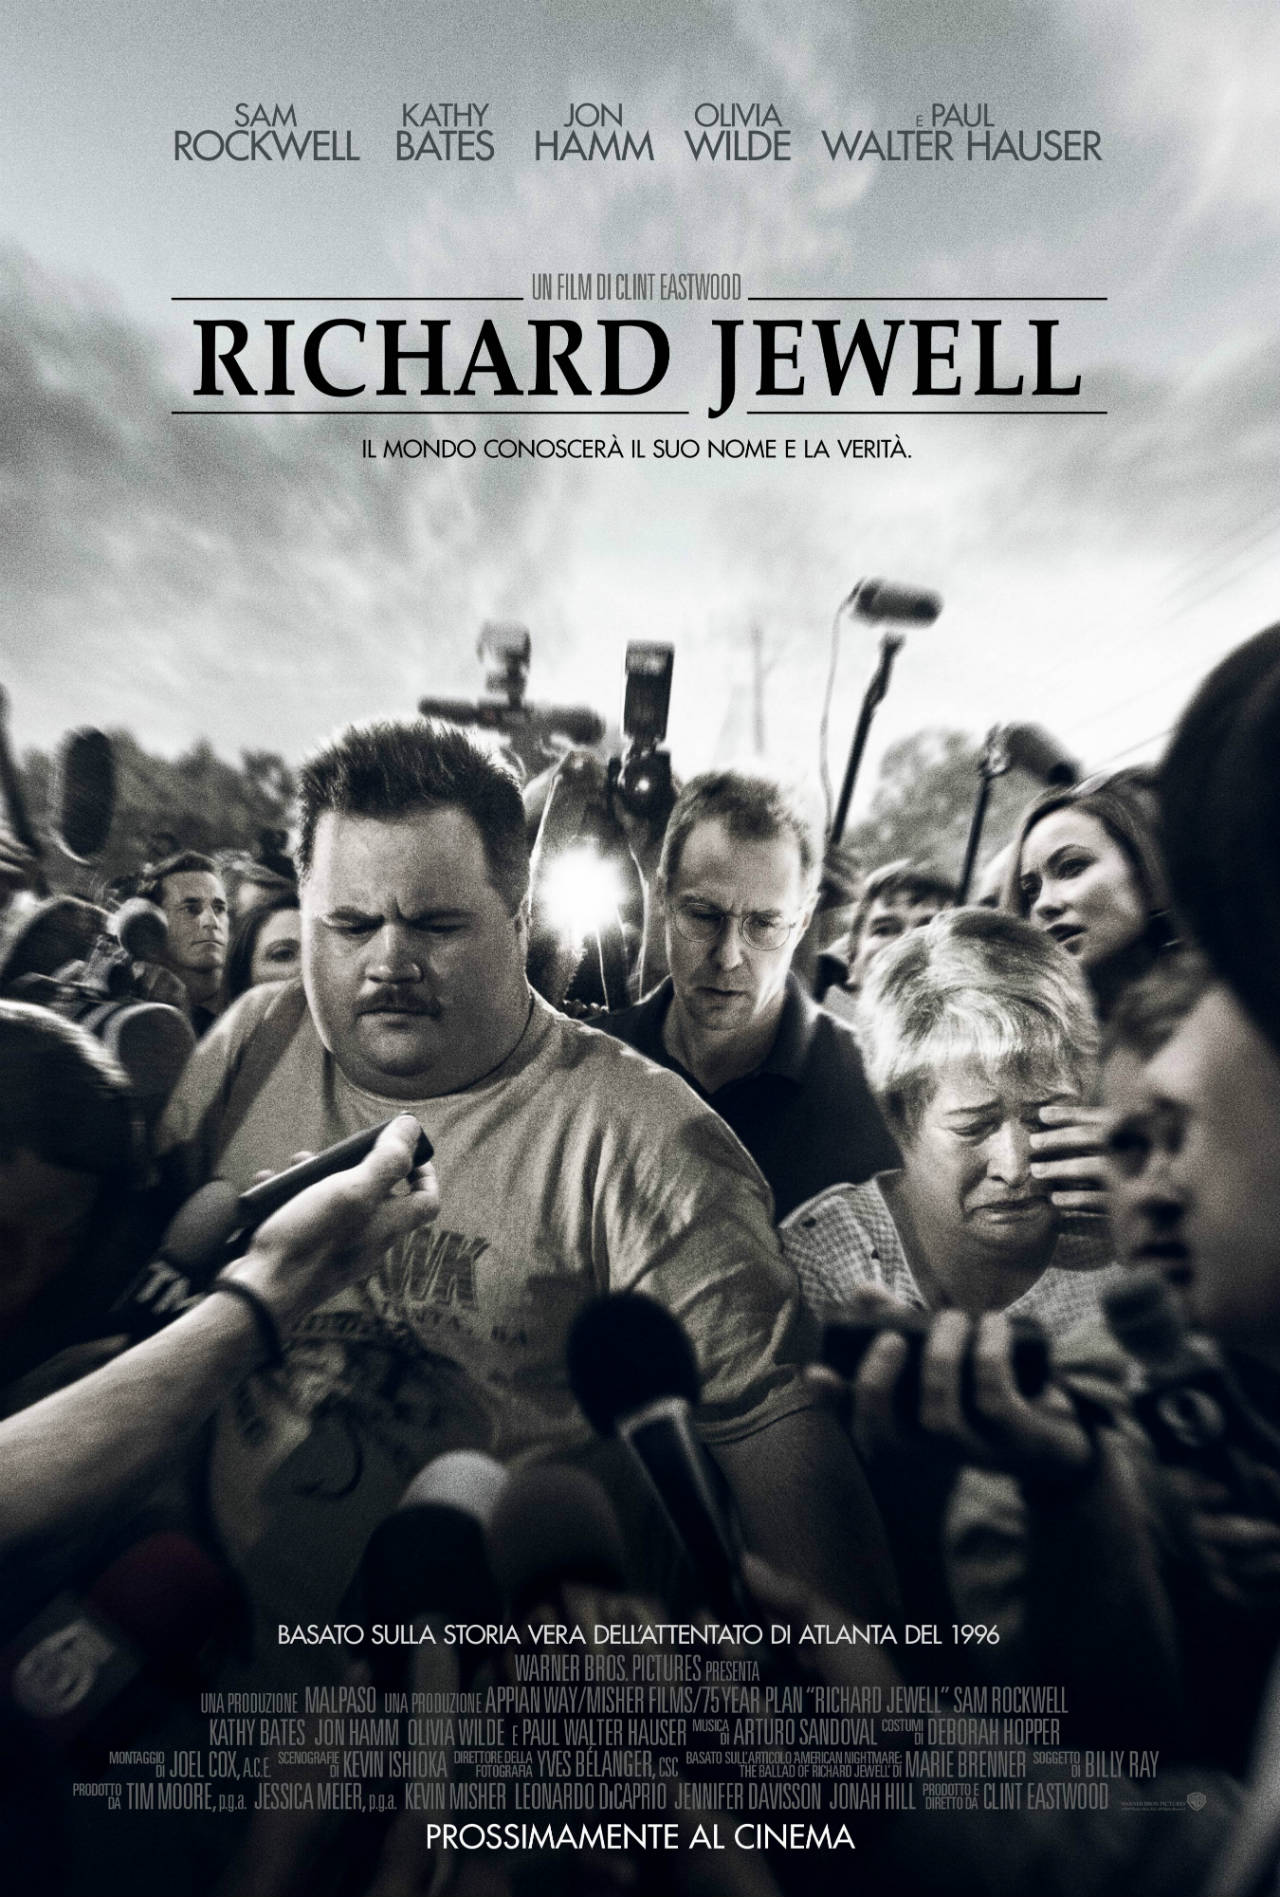 ITA_RDJWL_VERT_MARichard Jewell - Poster Ufficiale Italiano del film